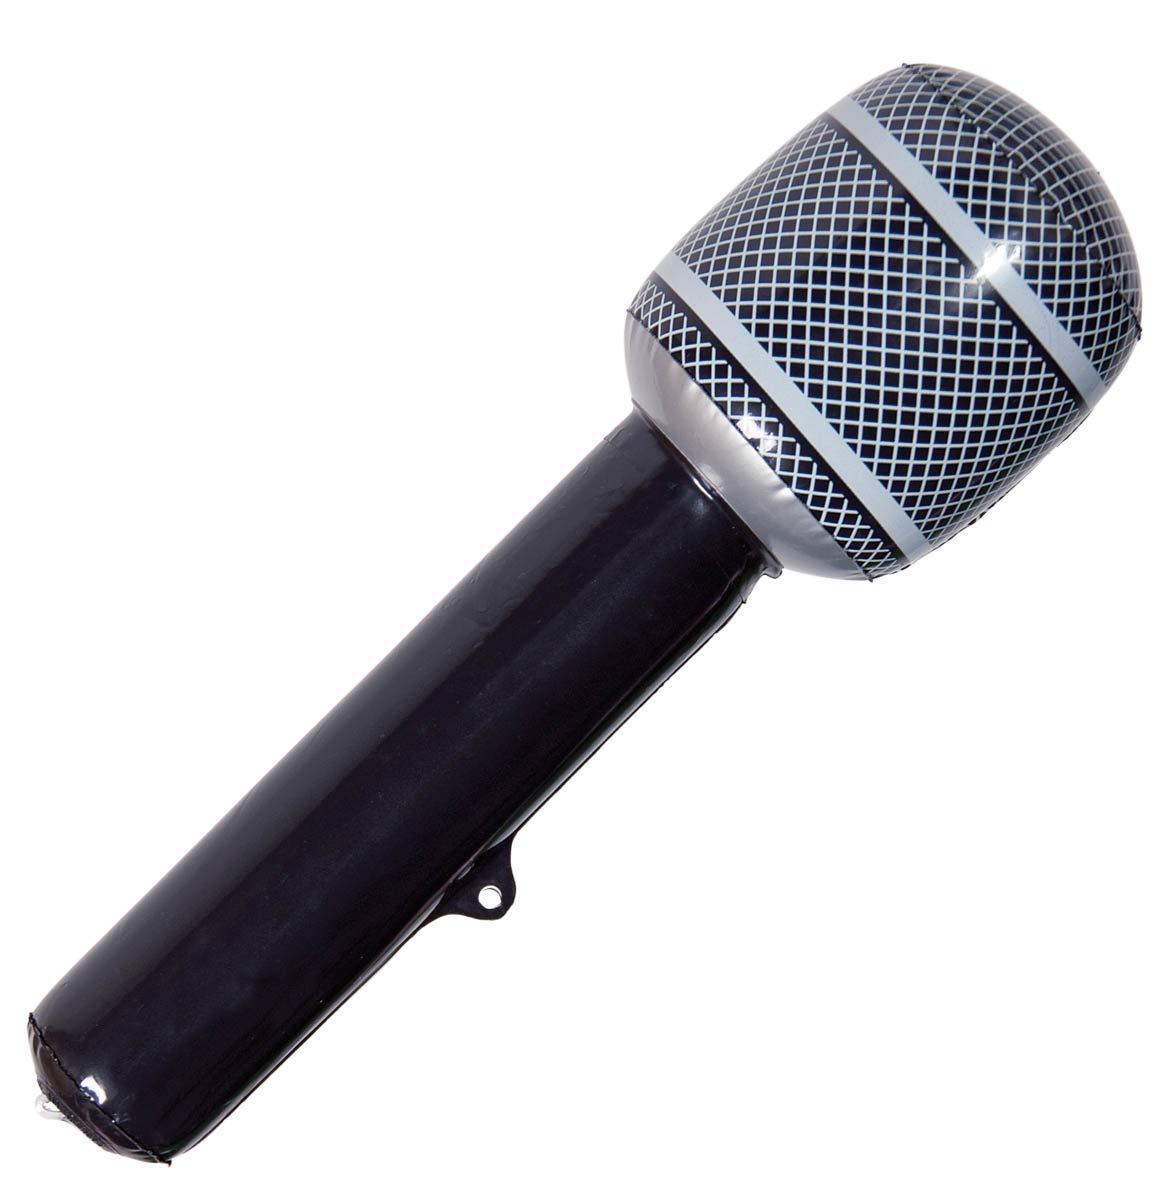 4x Aufblasbares Mikrofon Mikrofone Mikro Mikrophon Microphone Air Luft Micro